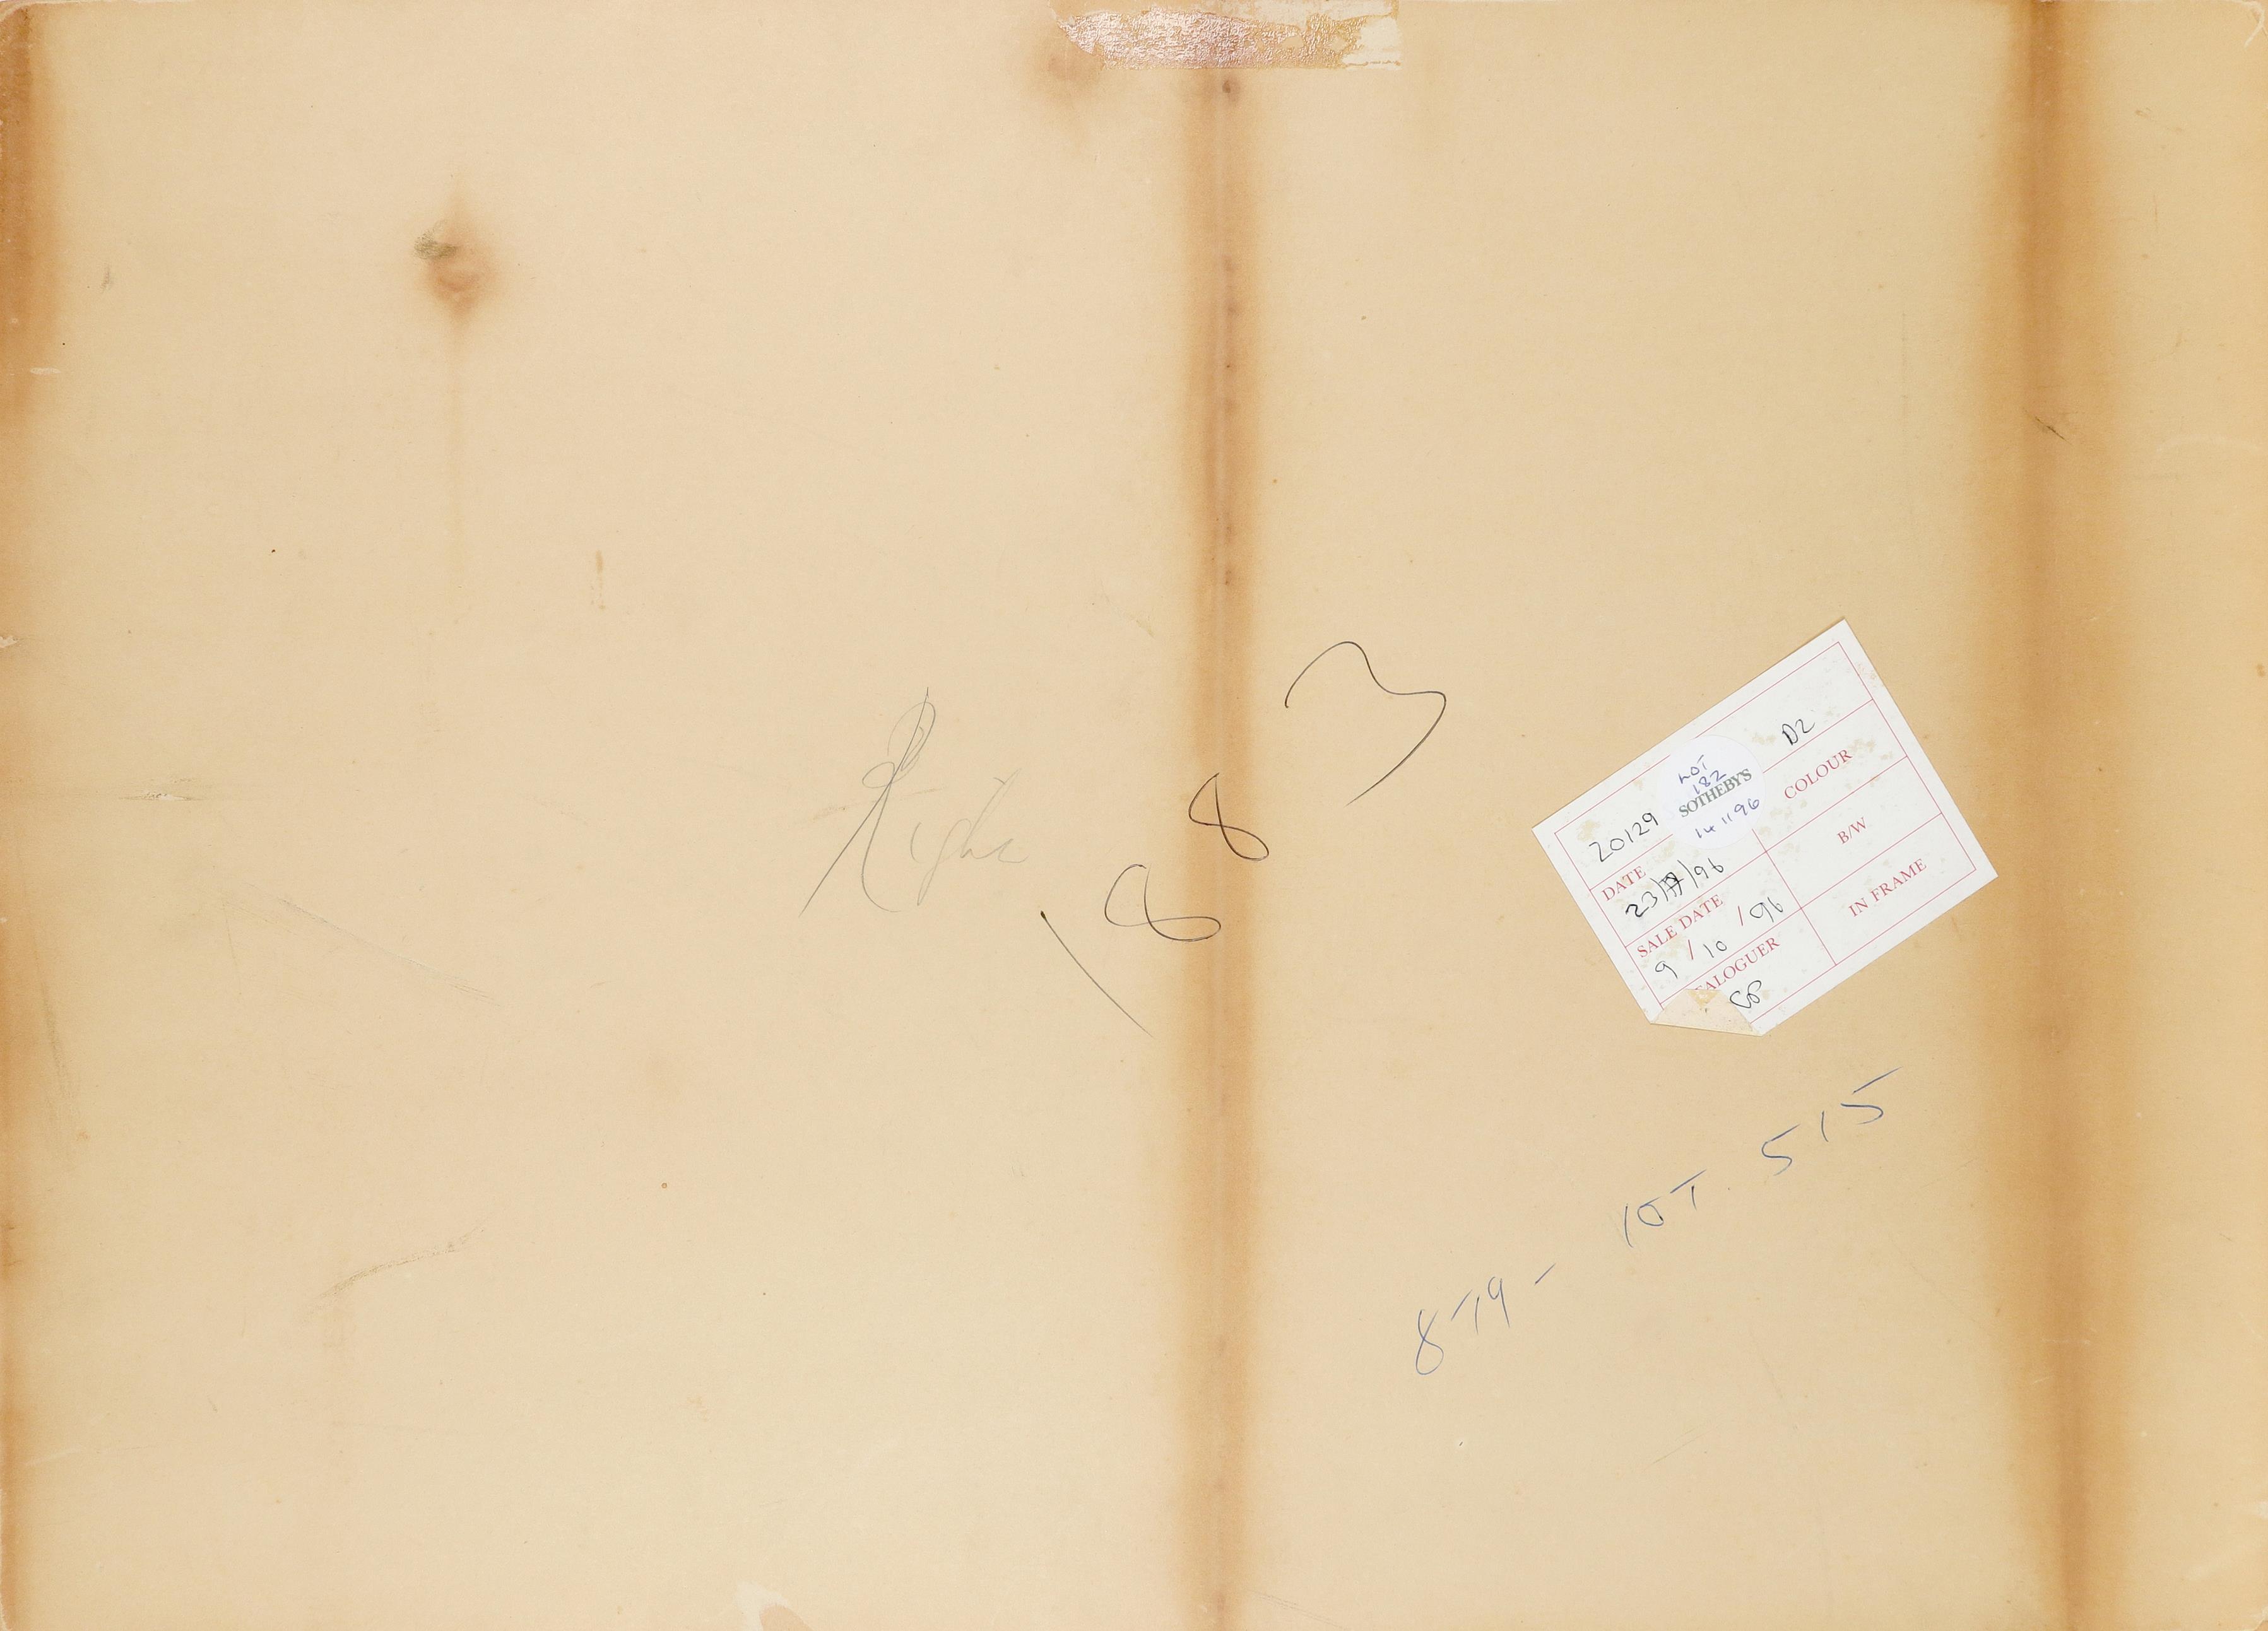 William James Müller (1812-1845) In the Rheinwalde Signed, inscribed and dated In the Rheinwalde / - Image 3 of 3